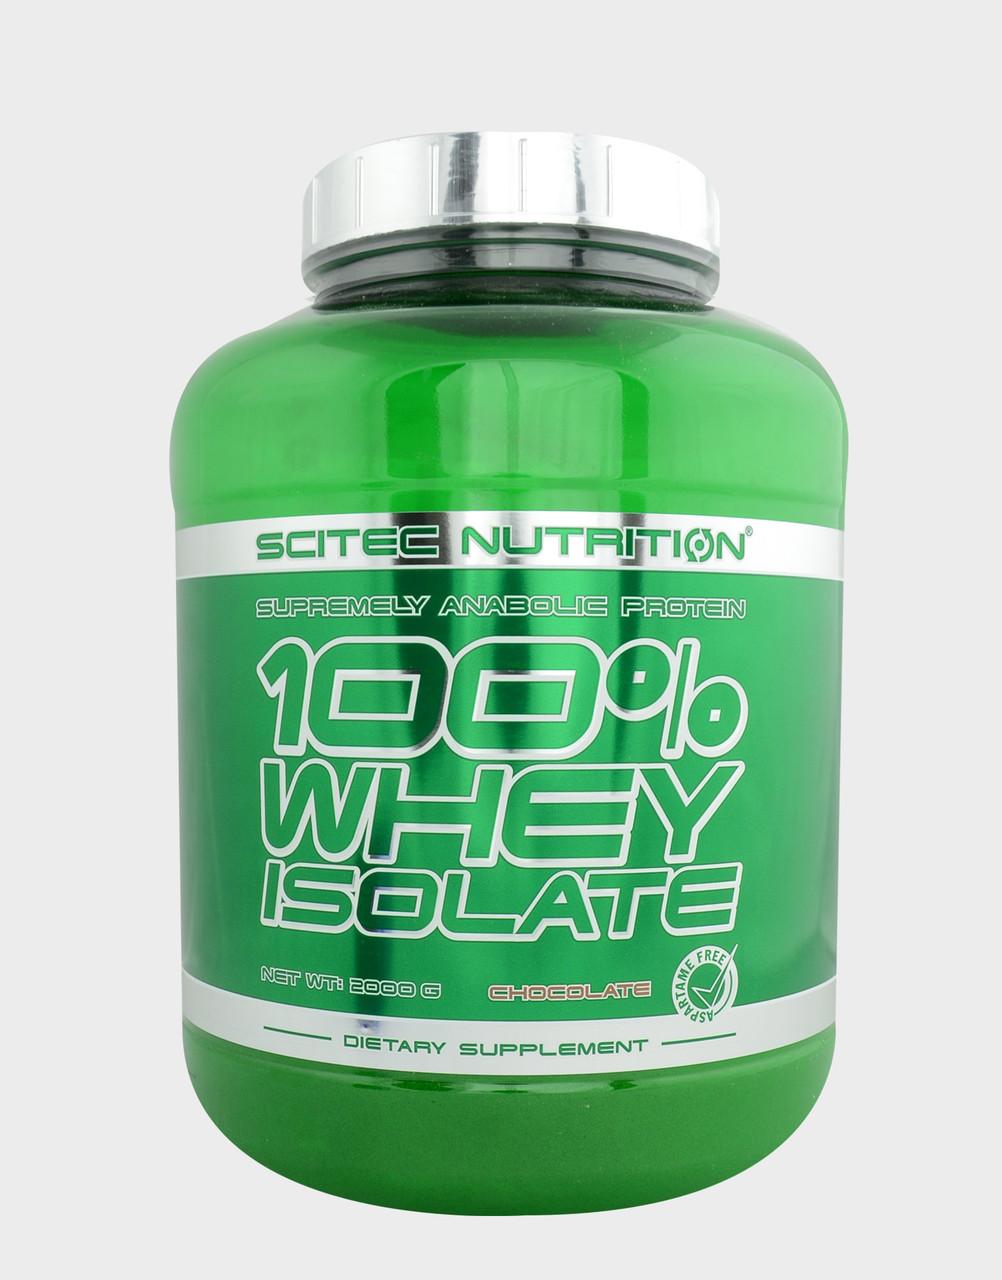 Сывороточный протеин Scitec Nutrition - 100% Whey Isolate (700 грамм)